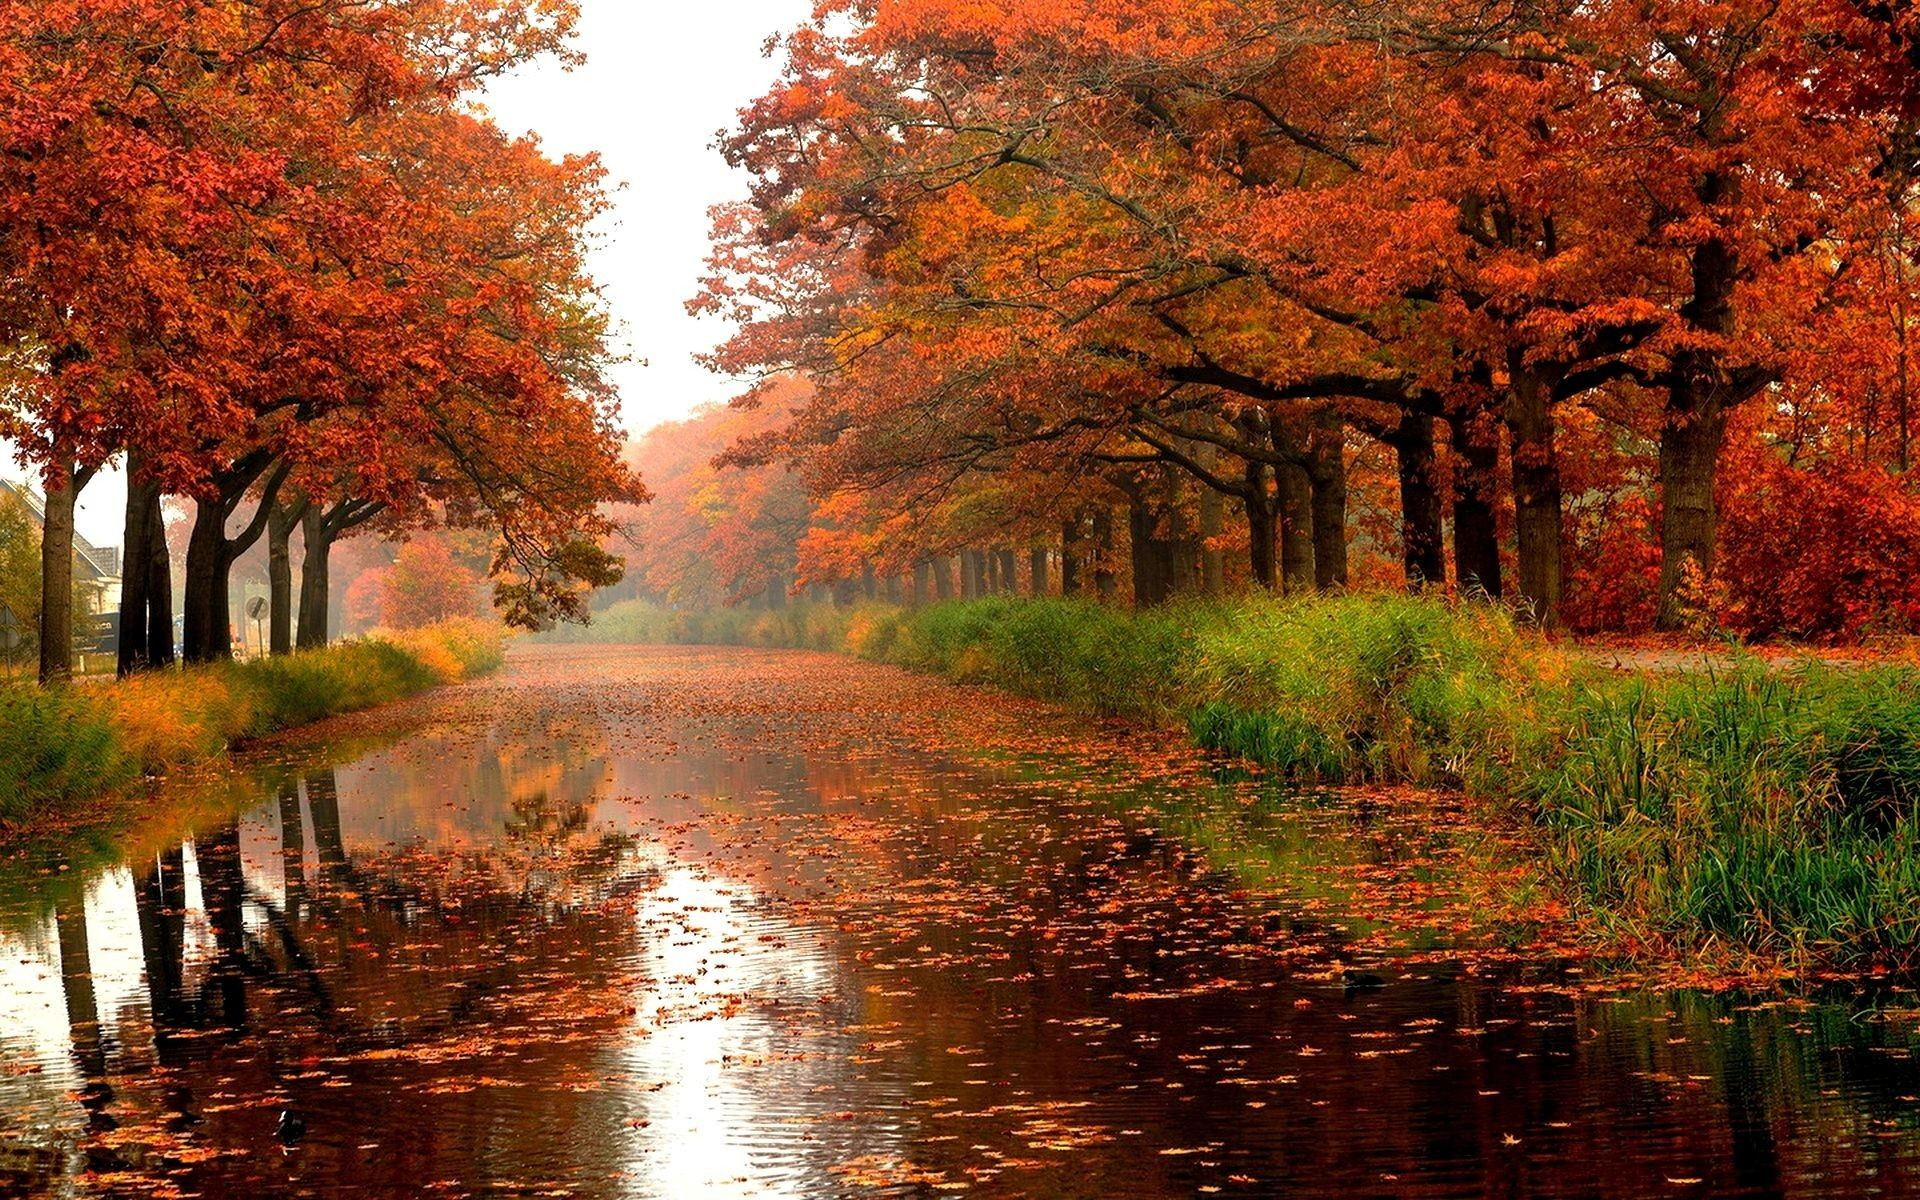 Rainy Fall Wallpaper (78+ images)